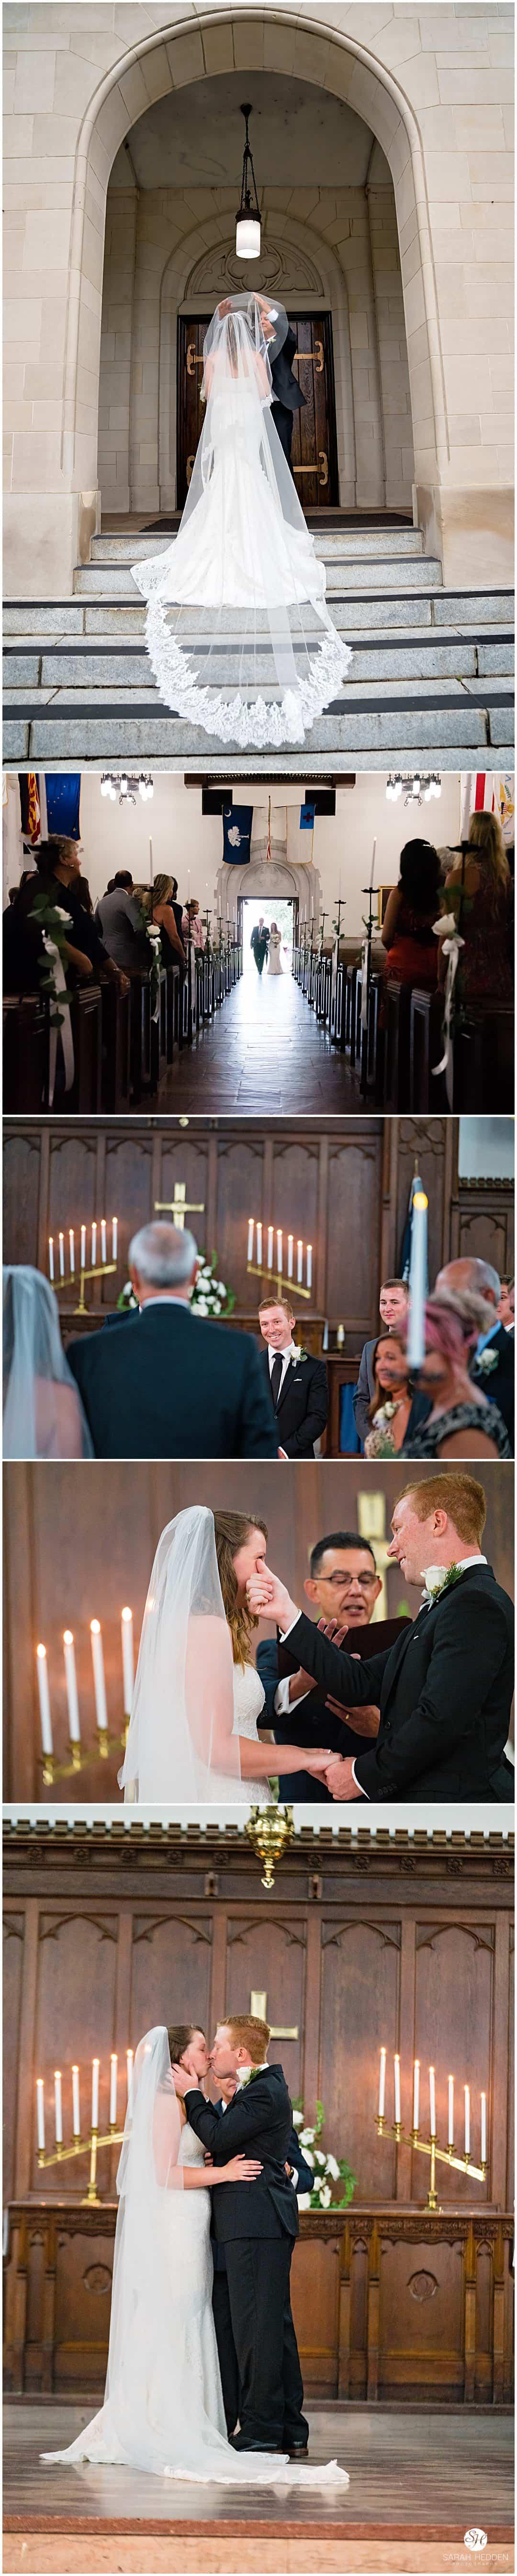 Bride and groom portraits at the Citadel at Bridgette and Jonathon's Wedding in Charleston